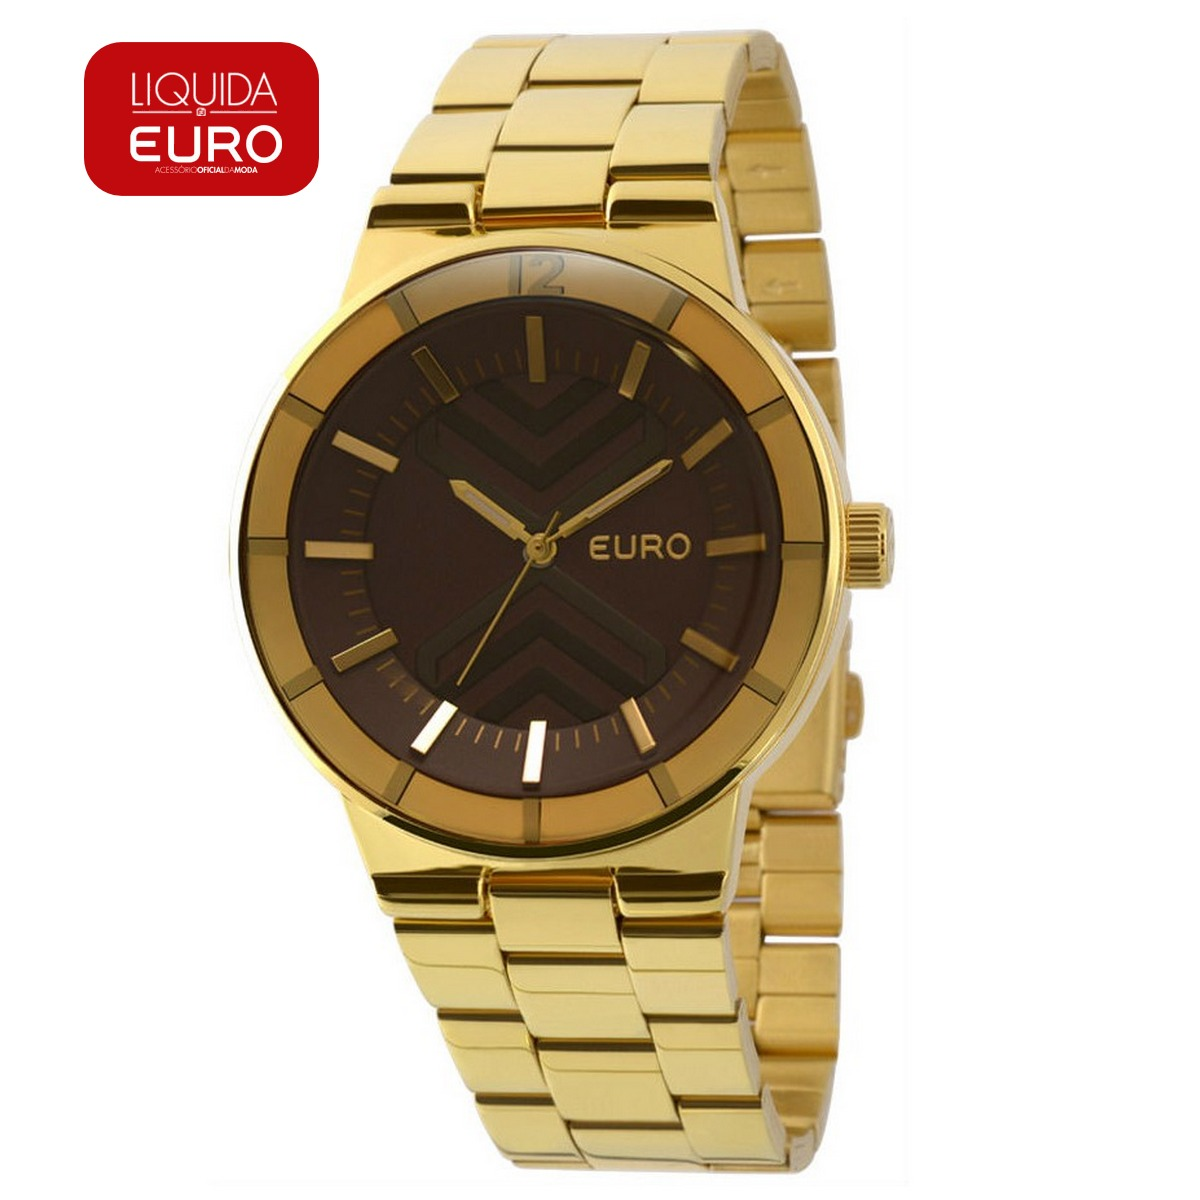 cef1689ebb0 Relógio Euro Fume Feminino Dourado Analógico - Eu2036lyr 4m - R  167 ...